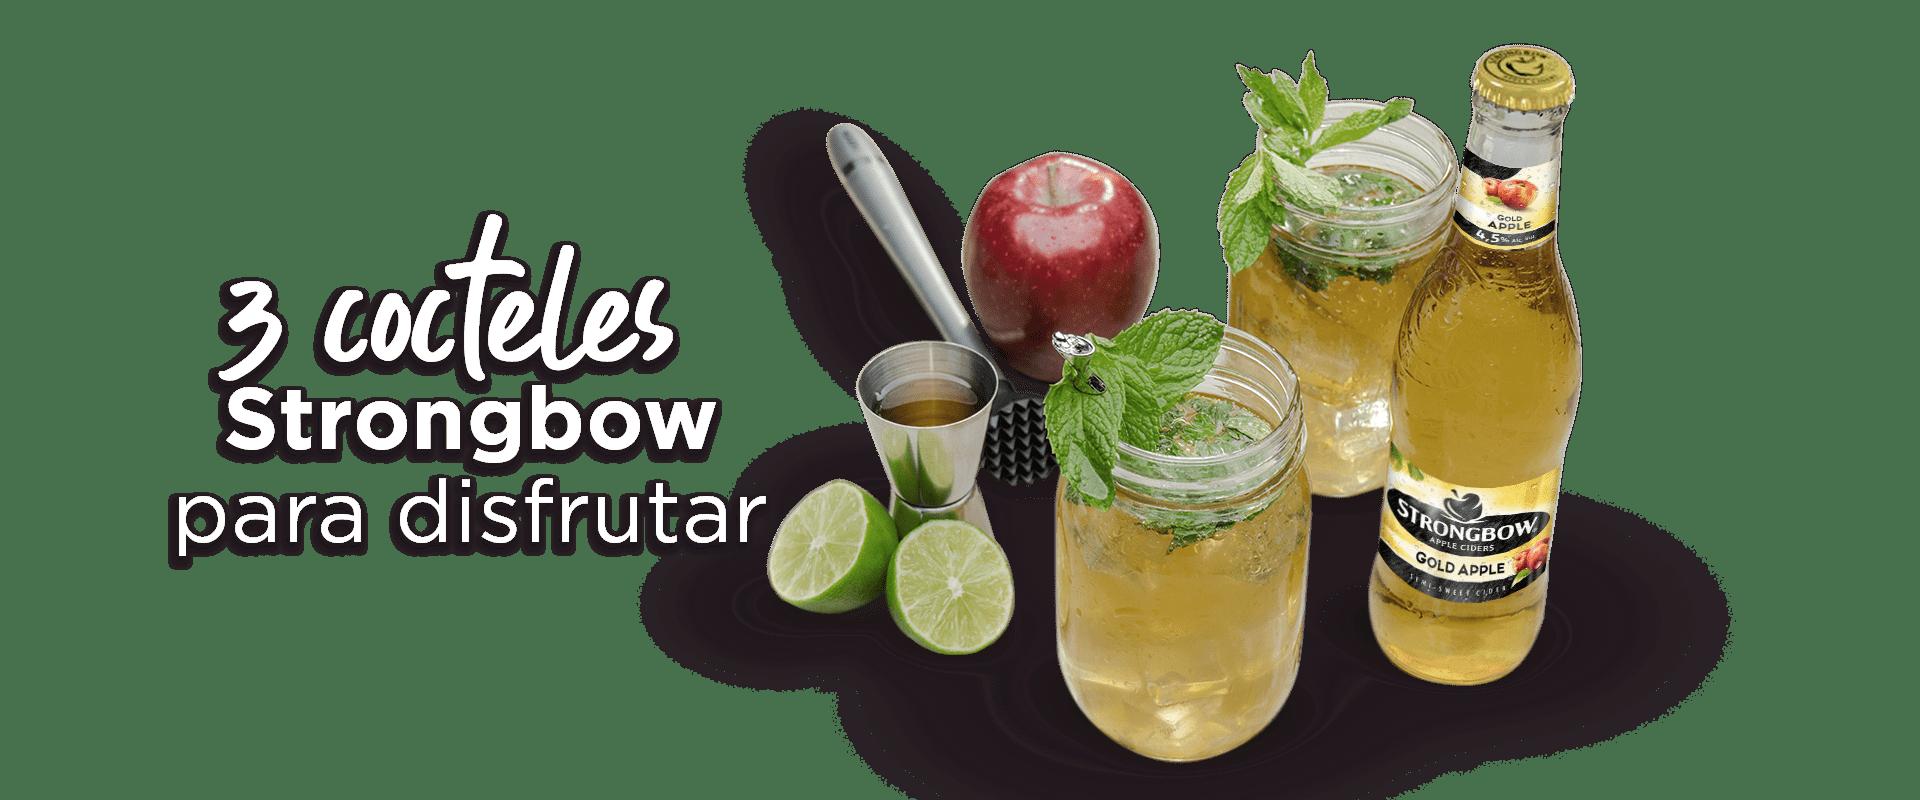 3 cocteles Strongbow para disfrutar